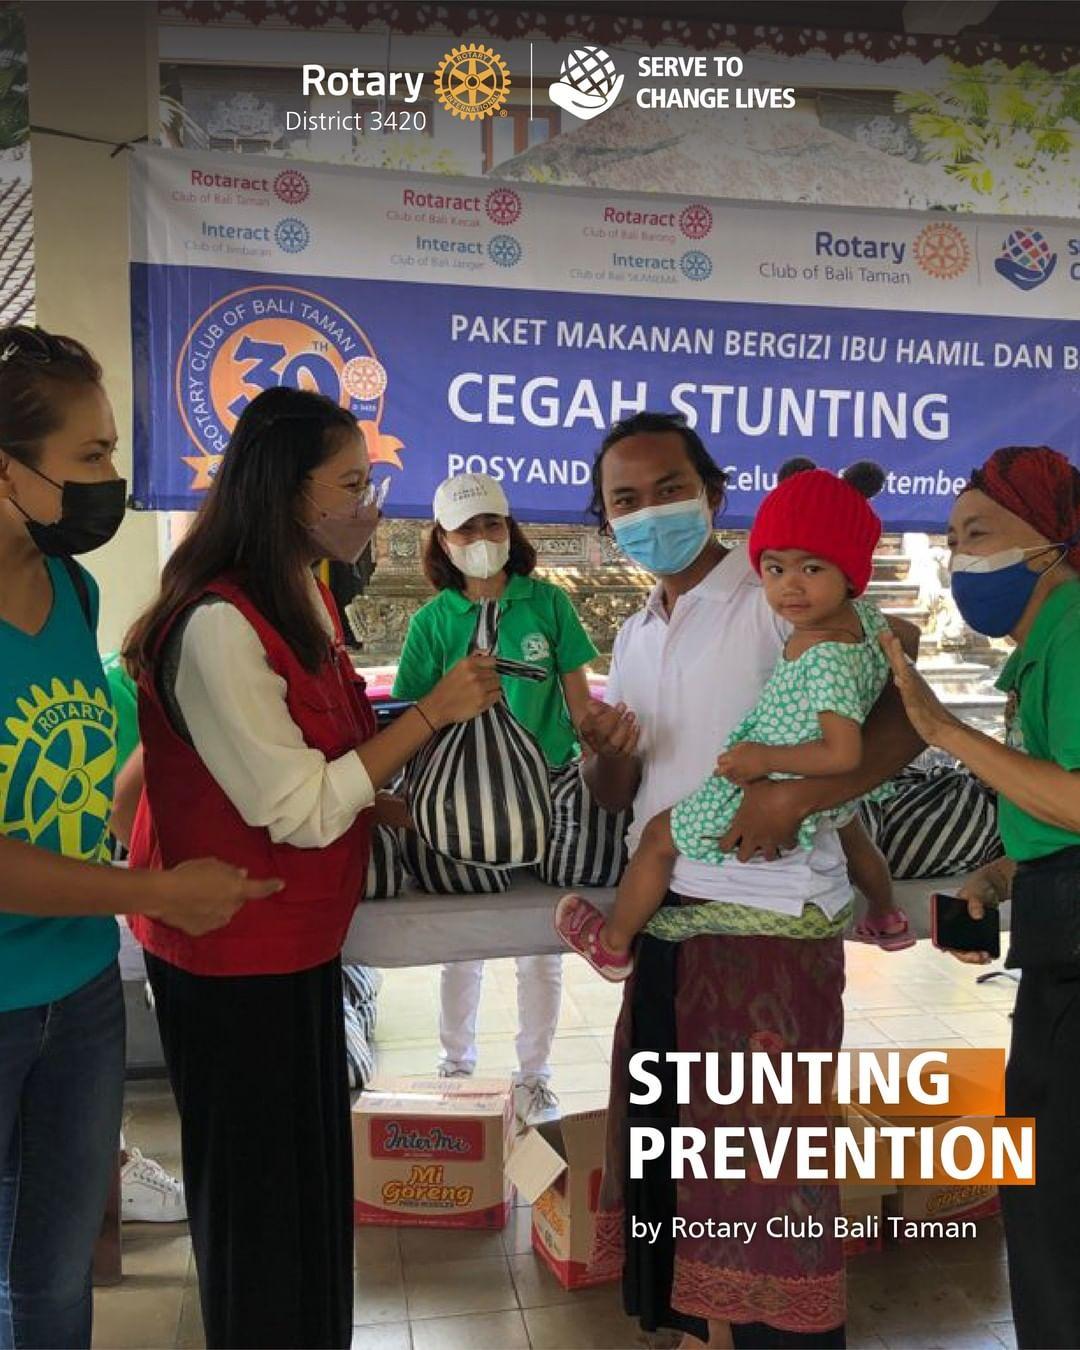 Stunting Prevention